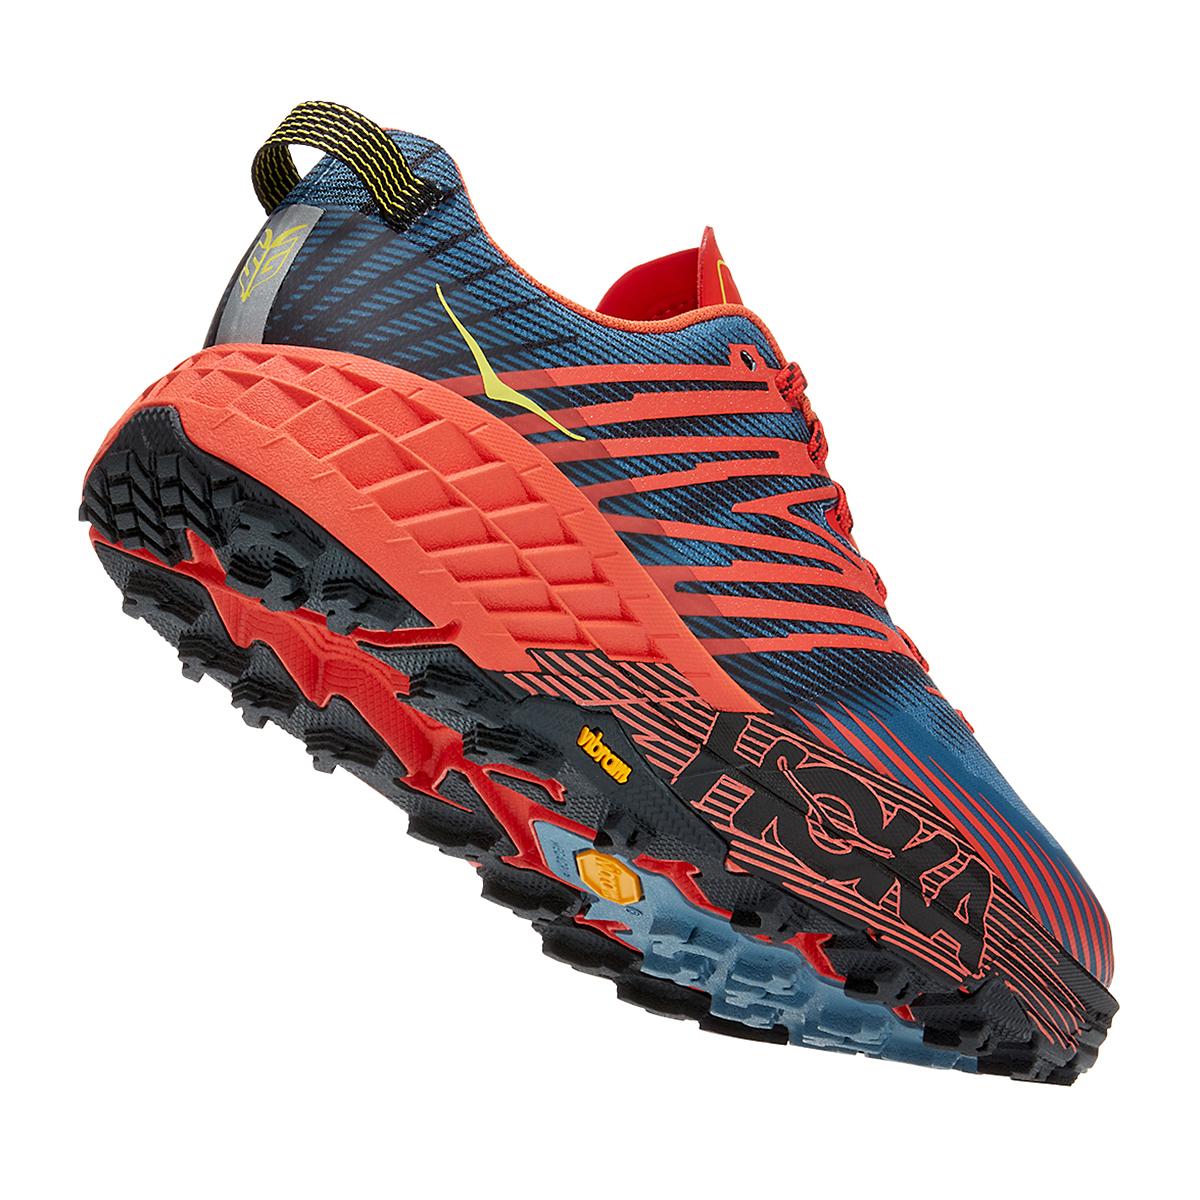 Men's Hoka One One Speedgoat 4 Trail Running Shoe, , large, image 6